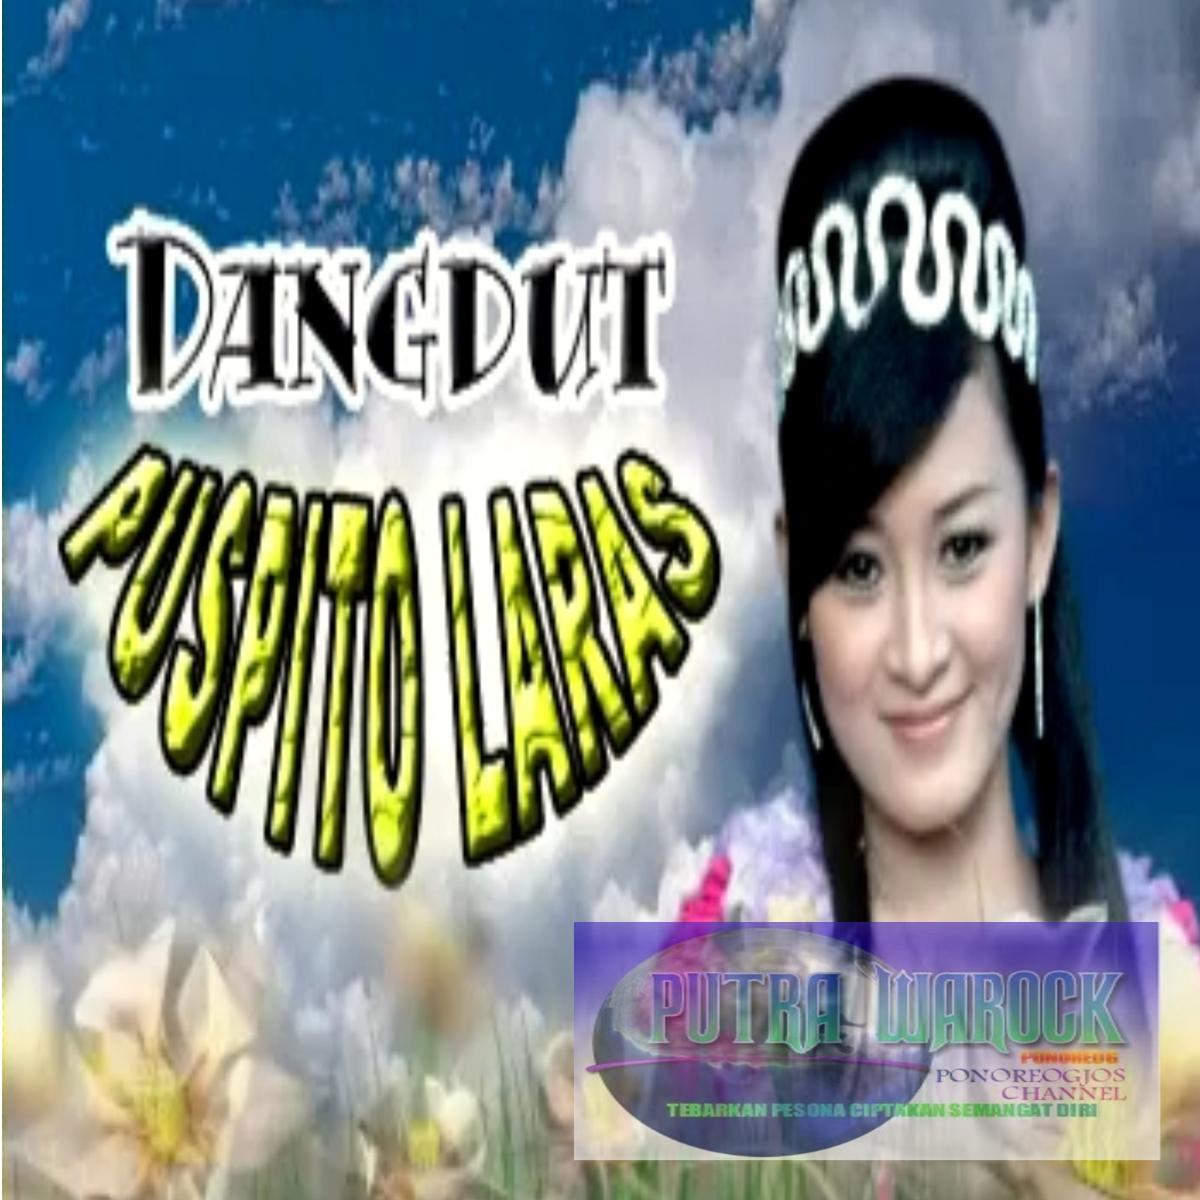 Donlod Lagu Dangdut Terbaru: Download Lagu Mp3 Dangdut Koplo Sagita Terbaru